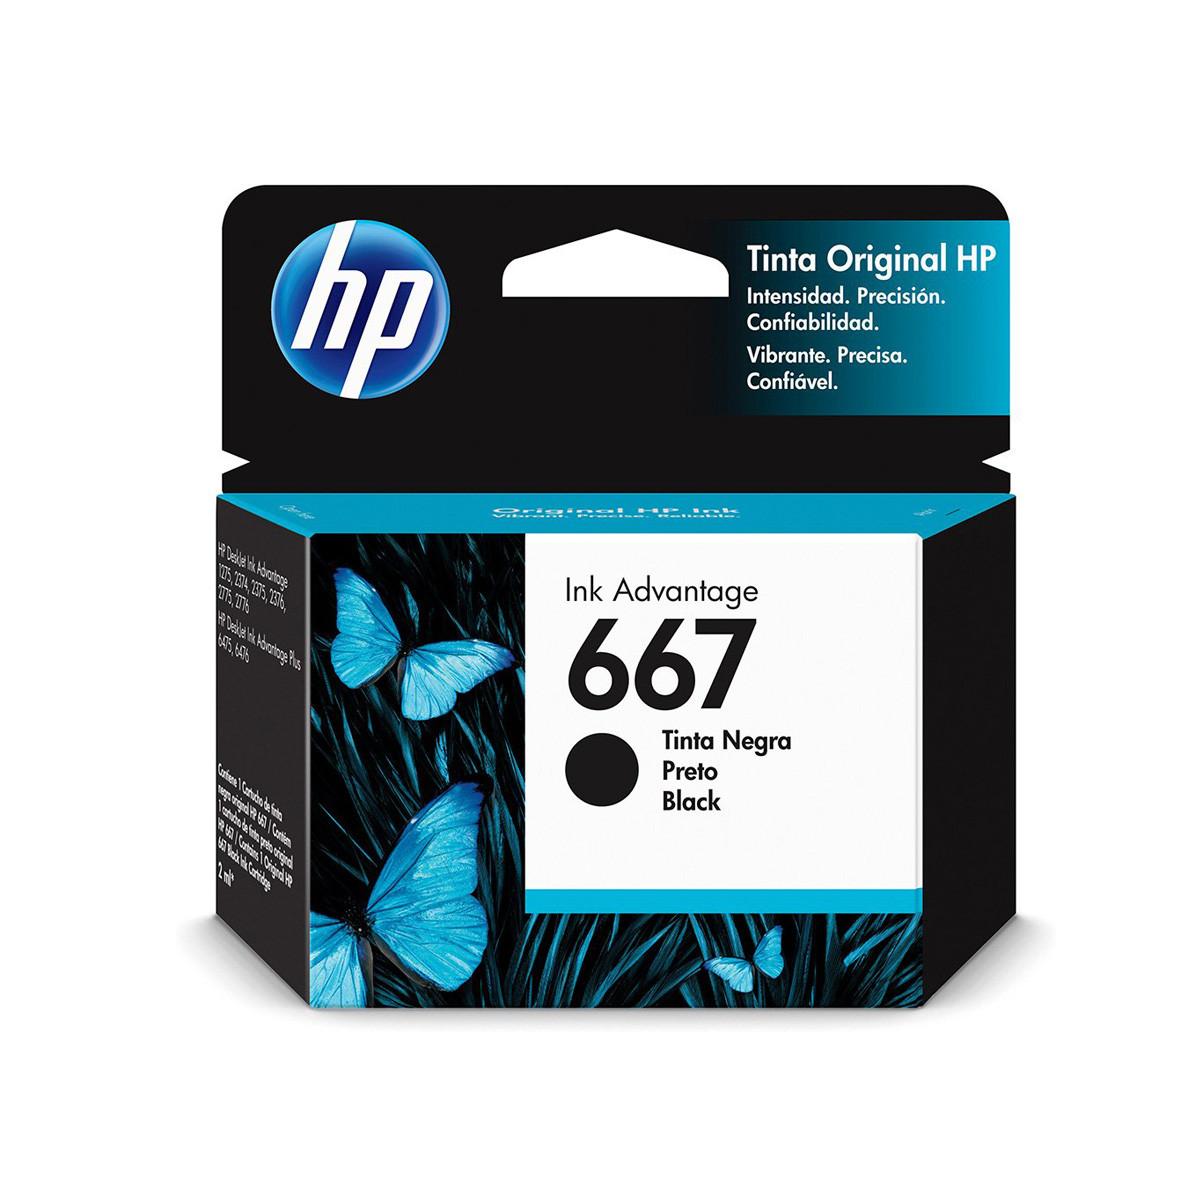 Cartucho de Tinta HP 667 Preto 3YM79L 3YM79AL | Deskjet Ink Advantage 2776 | Original